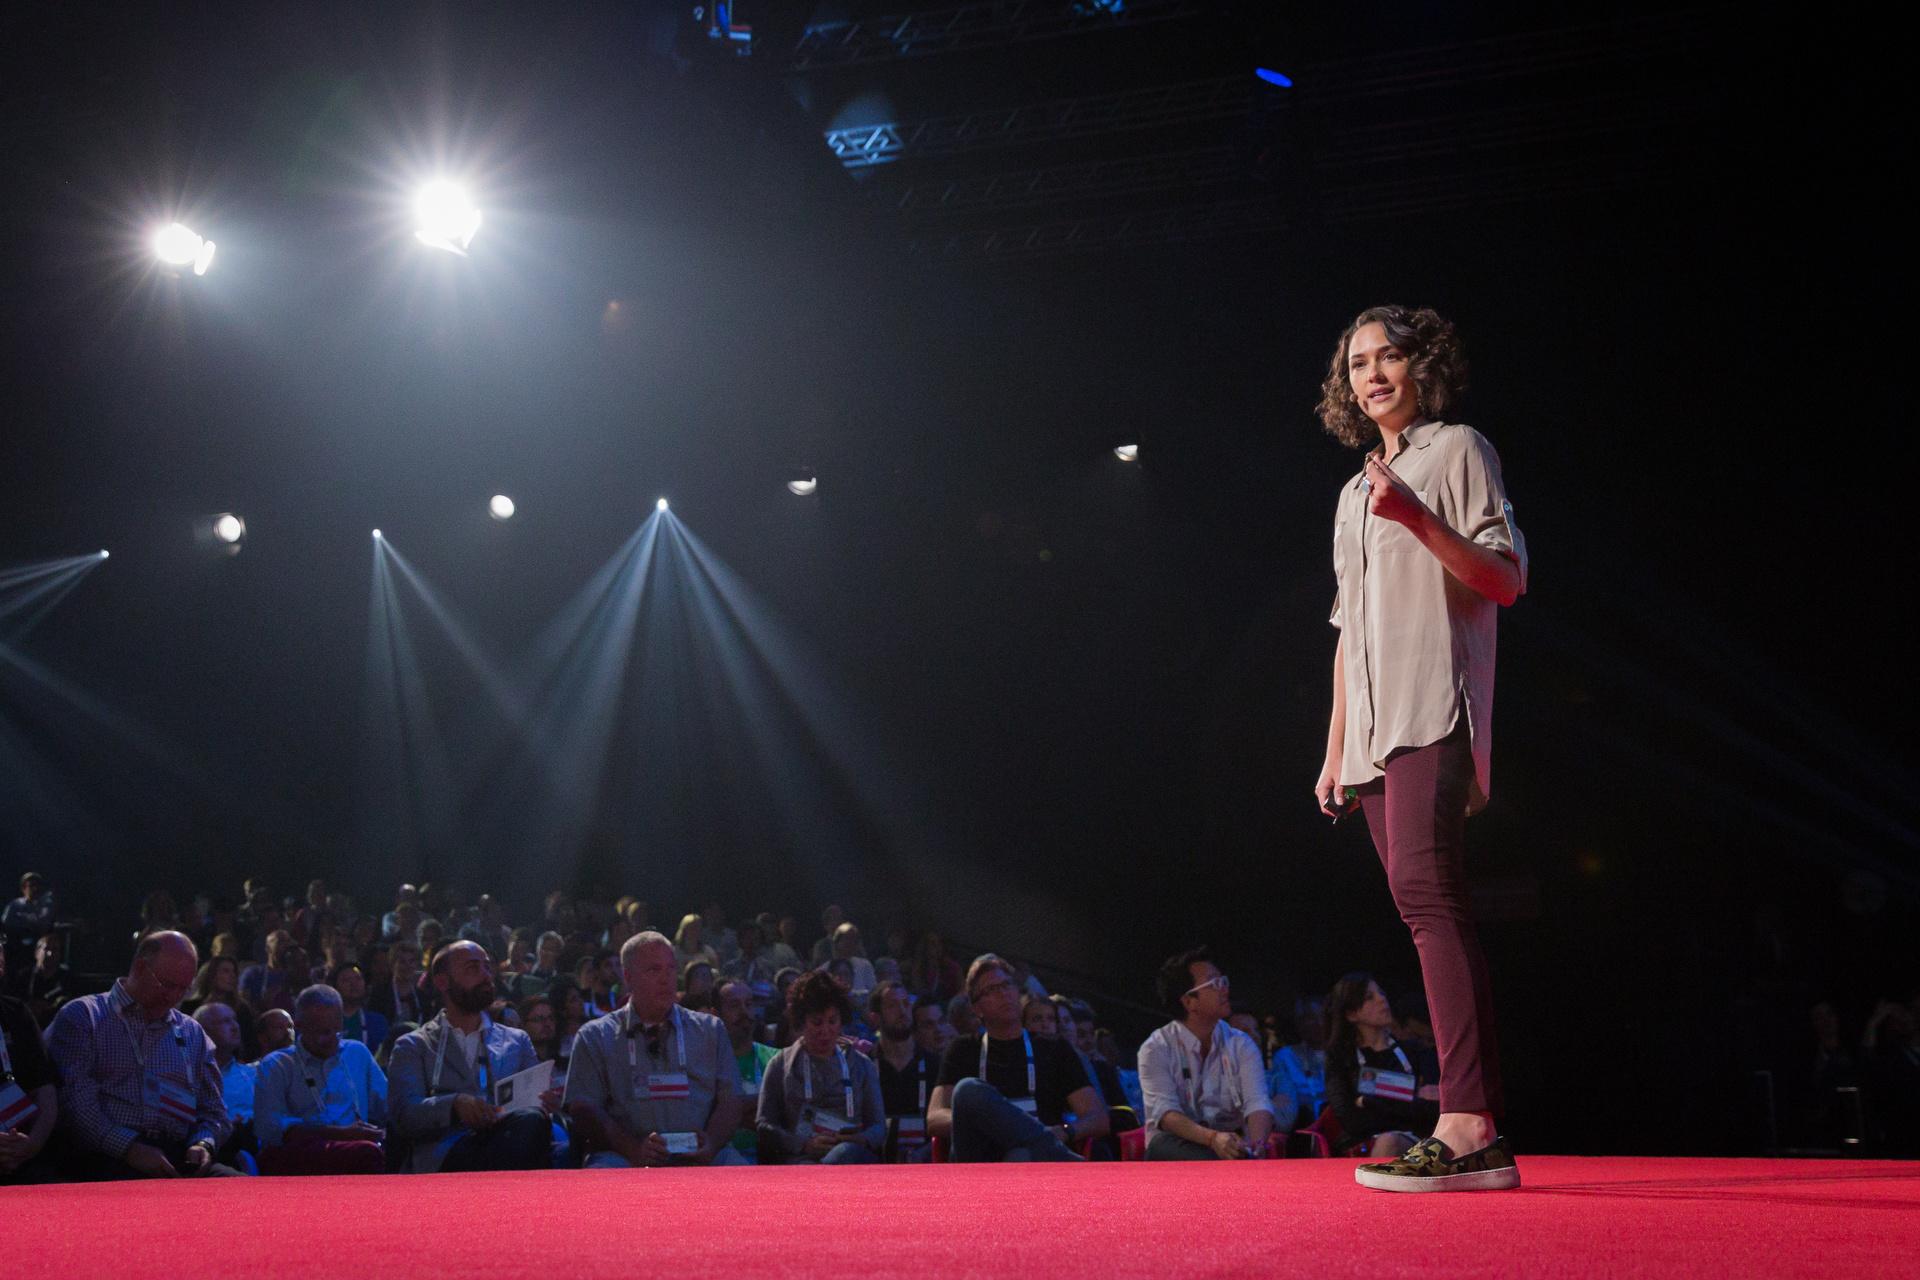 Pia Mancini speaking at TEDGlobal 2014. Photo: James Duncan Davidson/TED